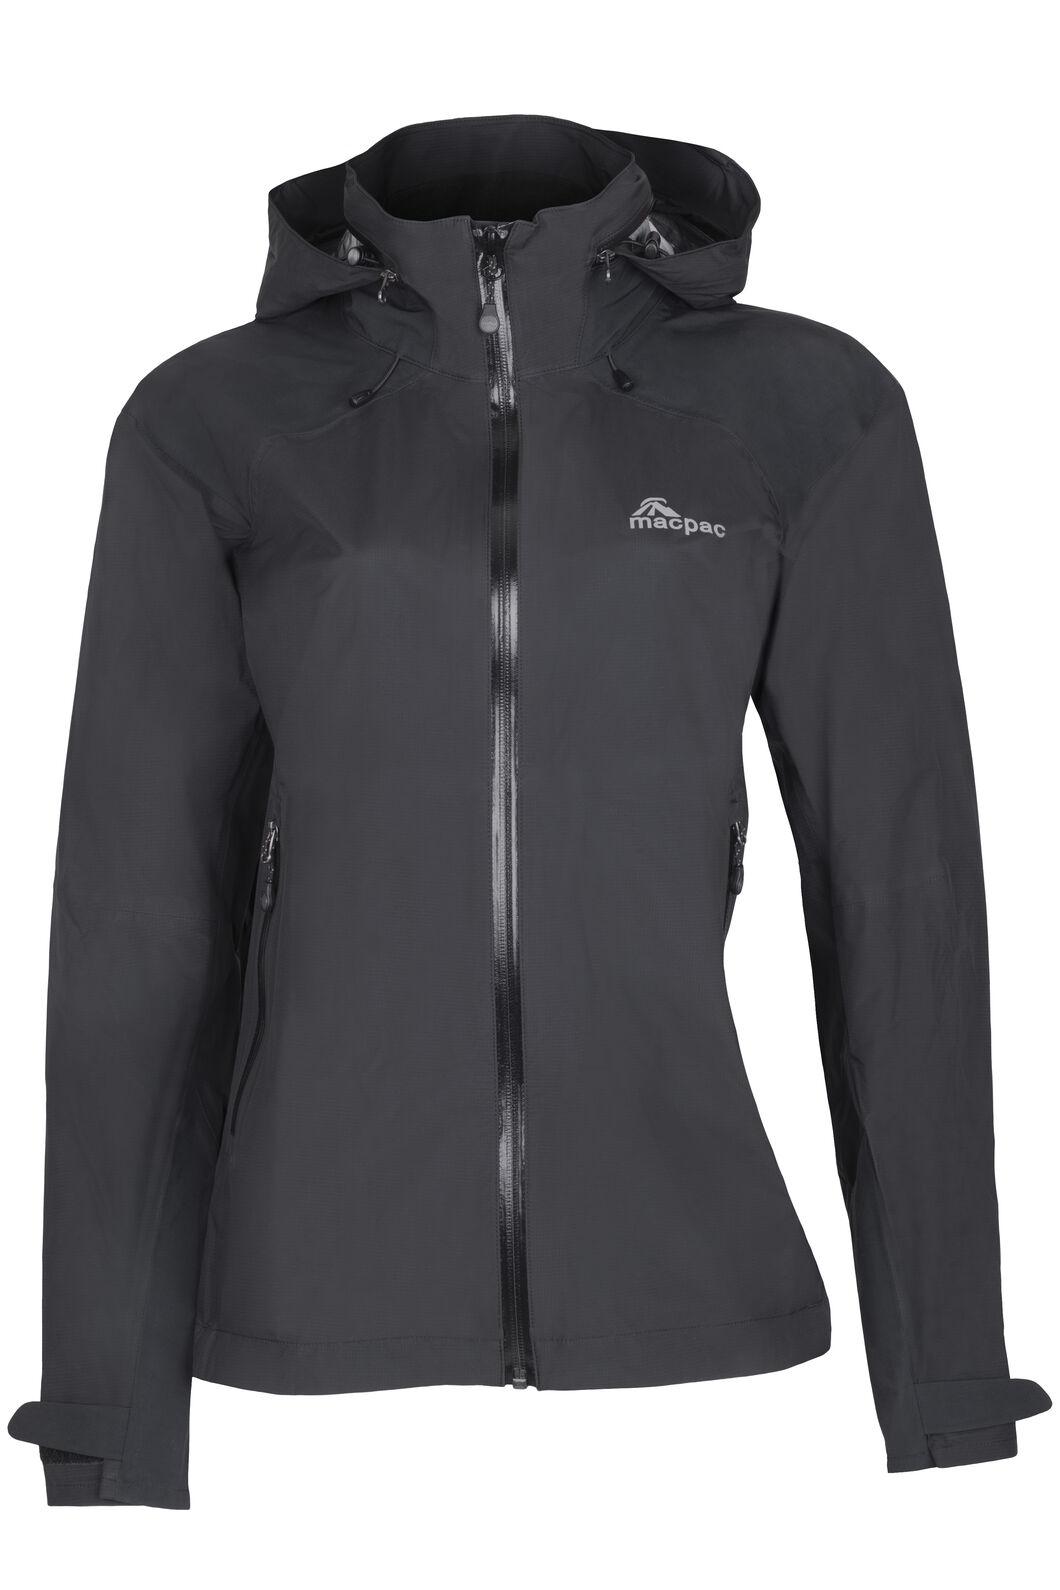 Macpac Traverse Pertex Shield® Rain Jacket - Women's, Black, hi-res